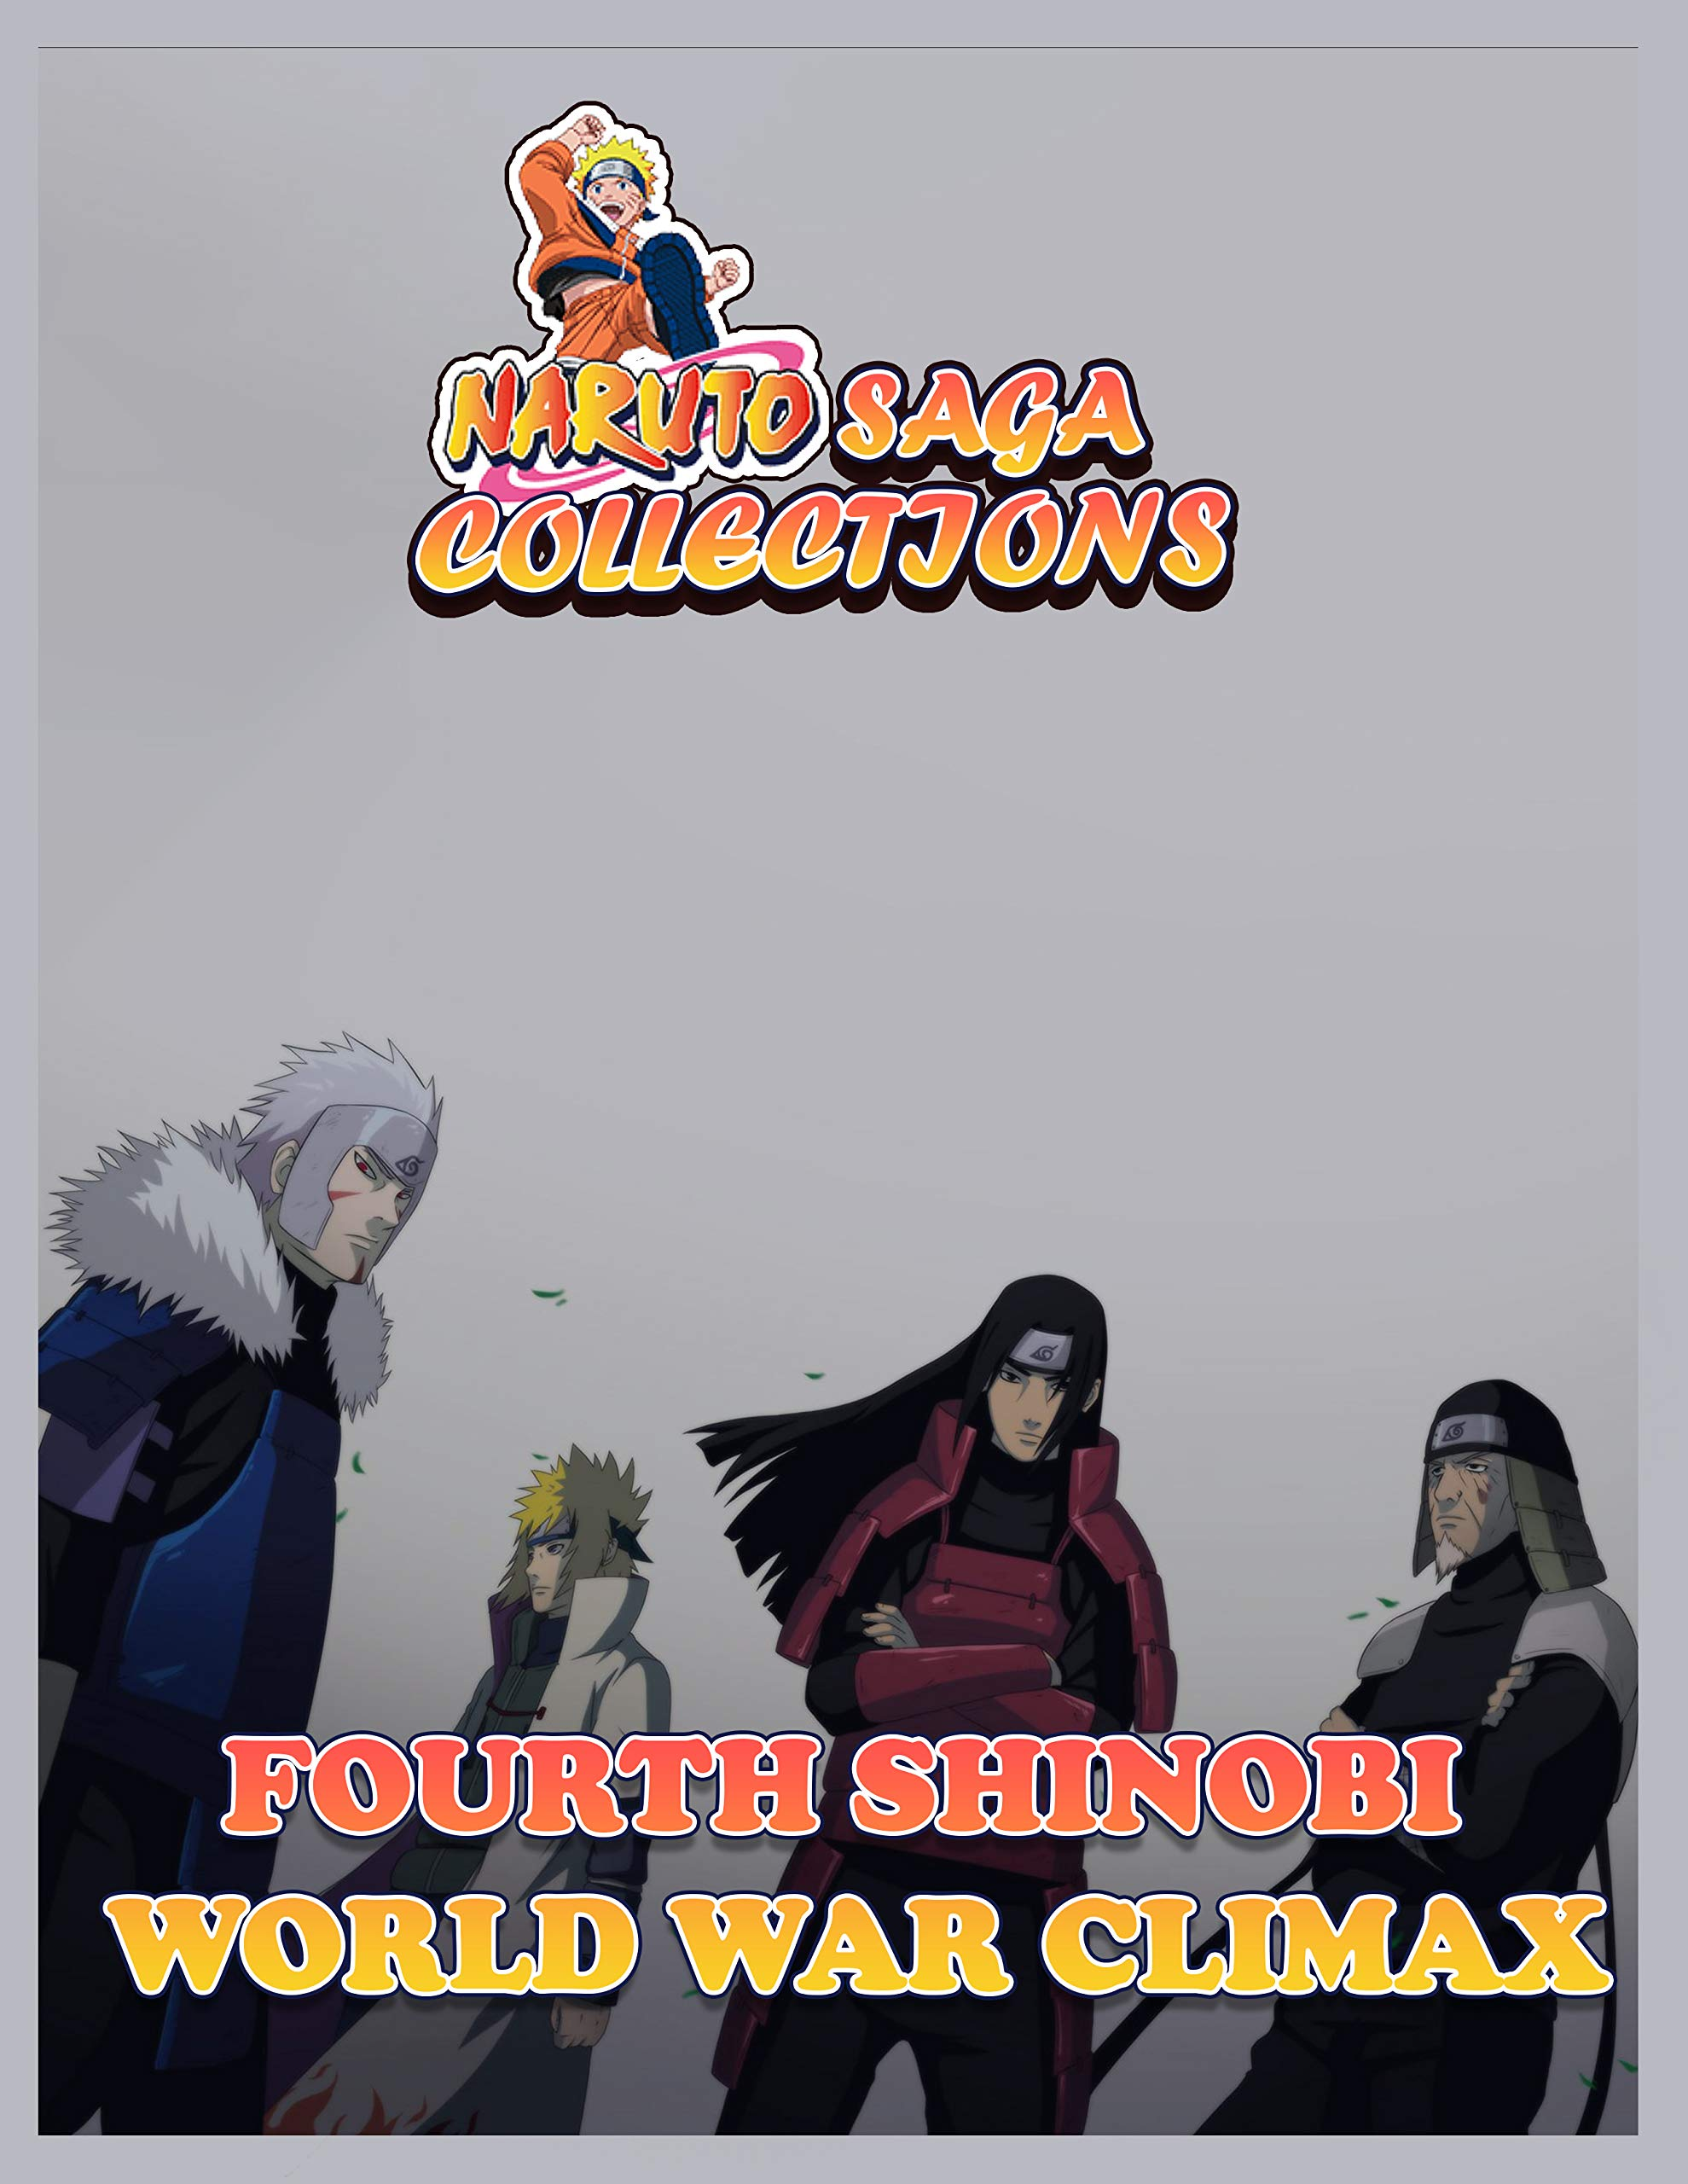 Manga Saga Collections: Naruto Fourth Shinobi World War Climax Vol 17